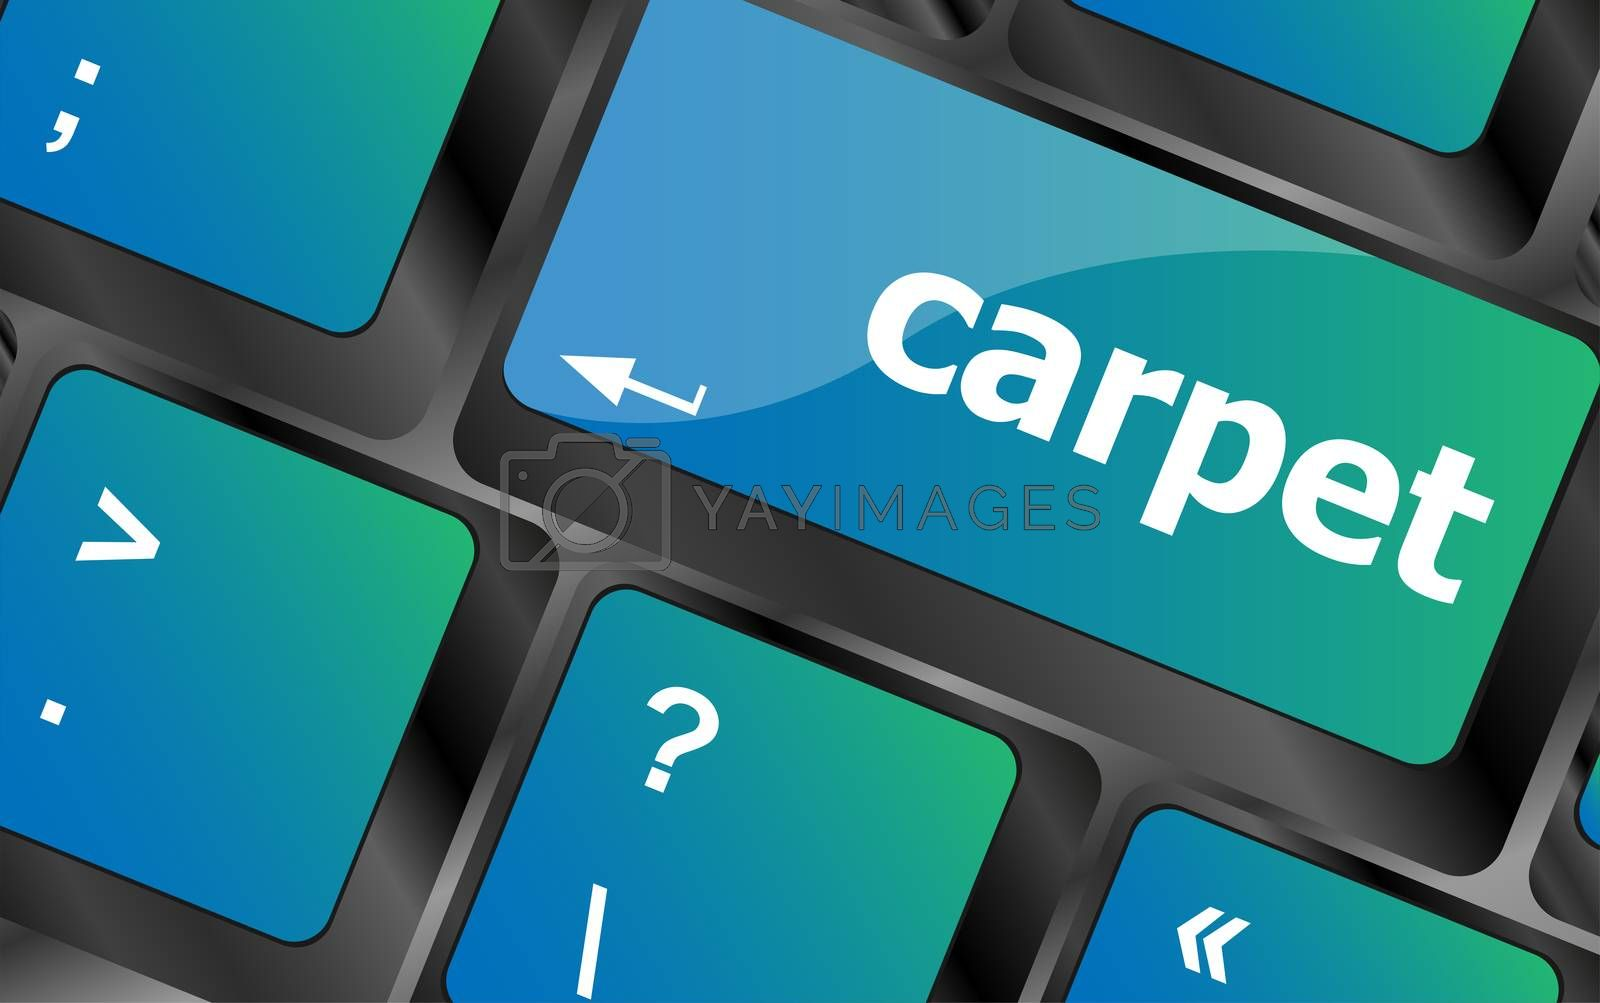 carpet word on computer pc keyboard key